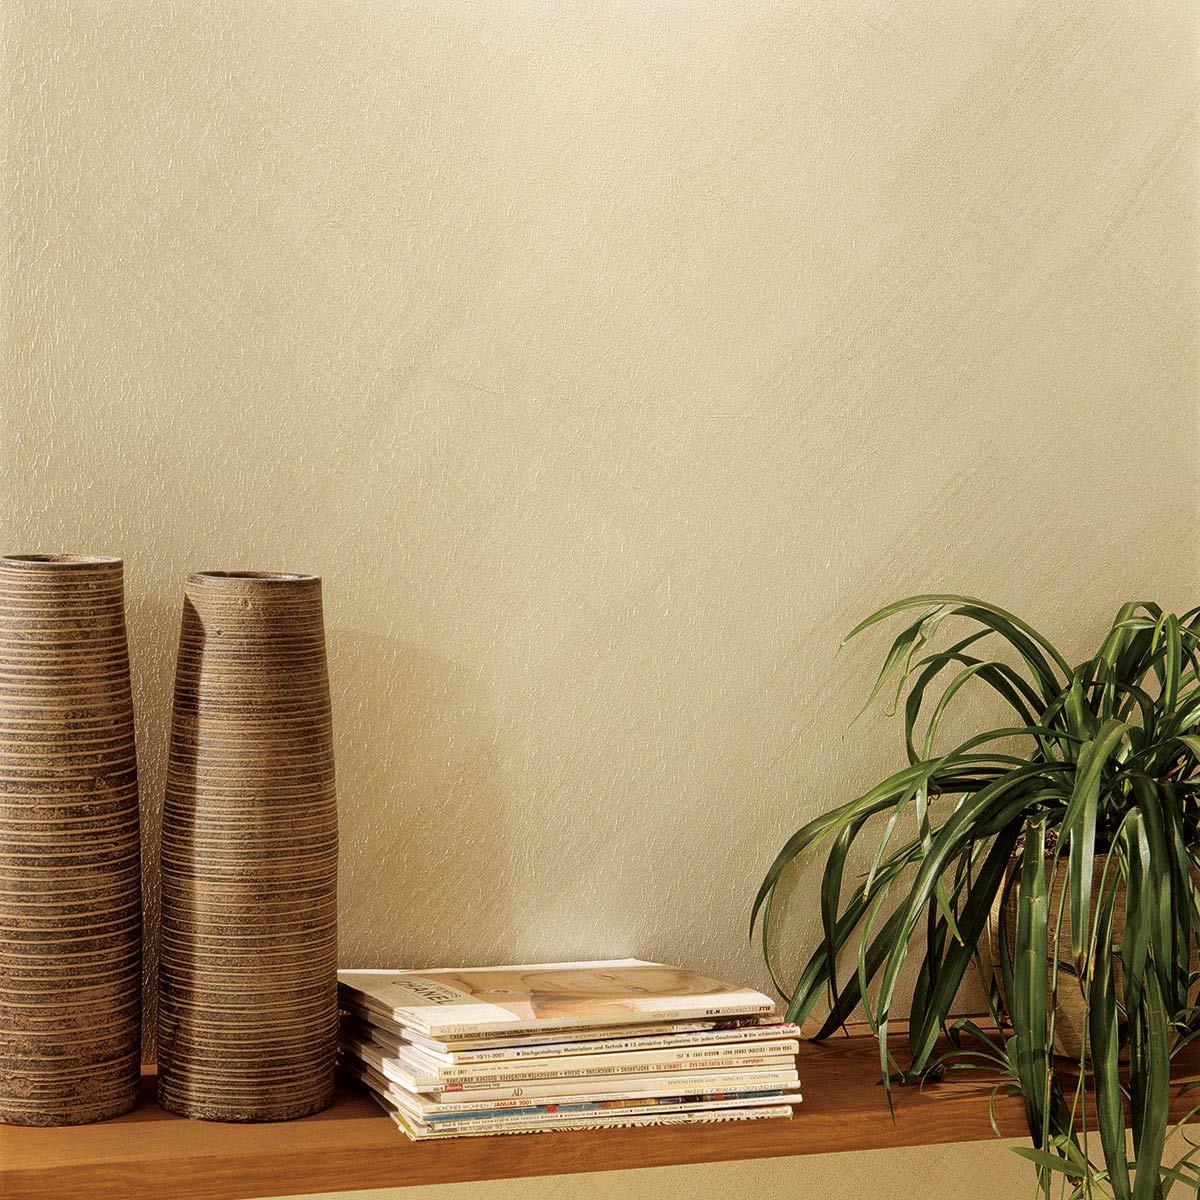 6 X Ingrain Wallpaper Woodchip Classico 63 6m 178 Texture